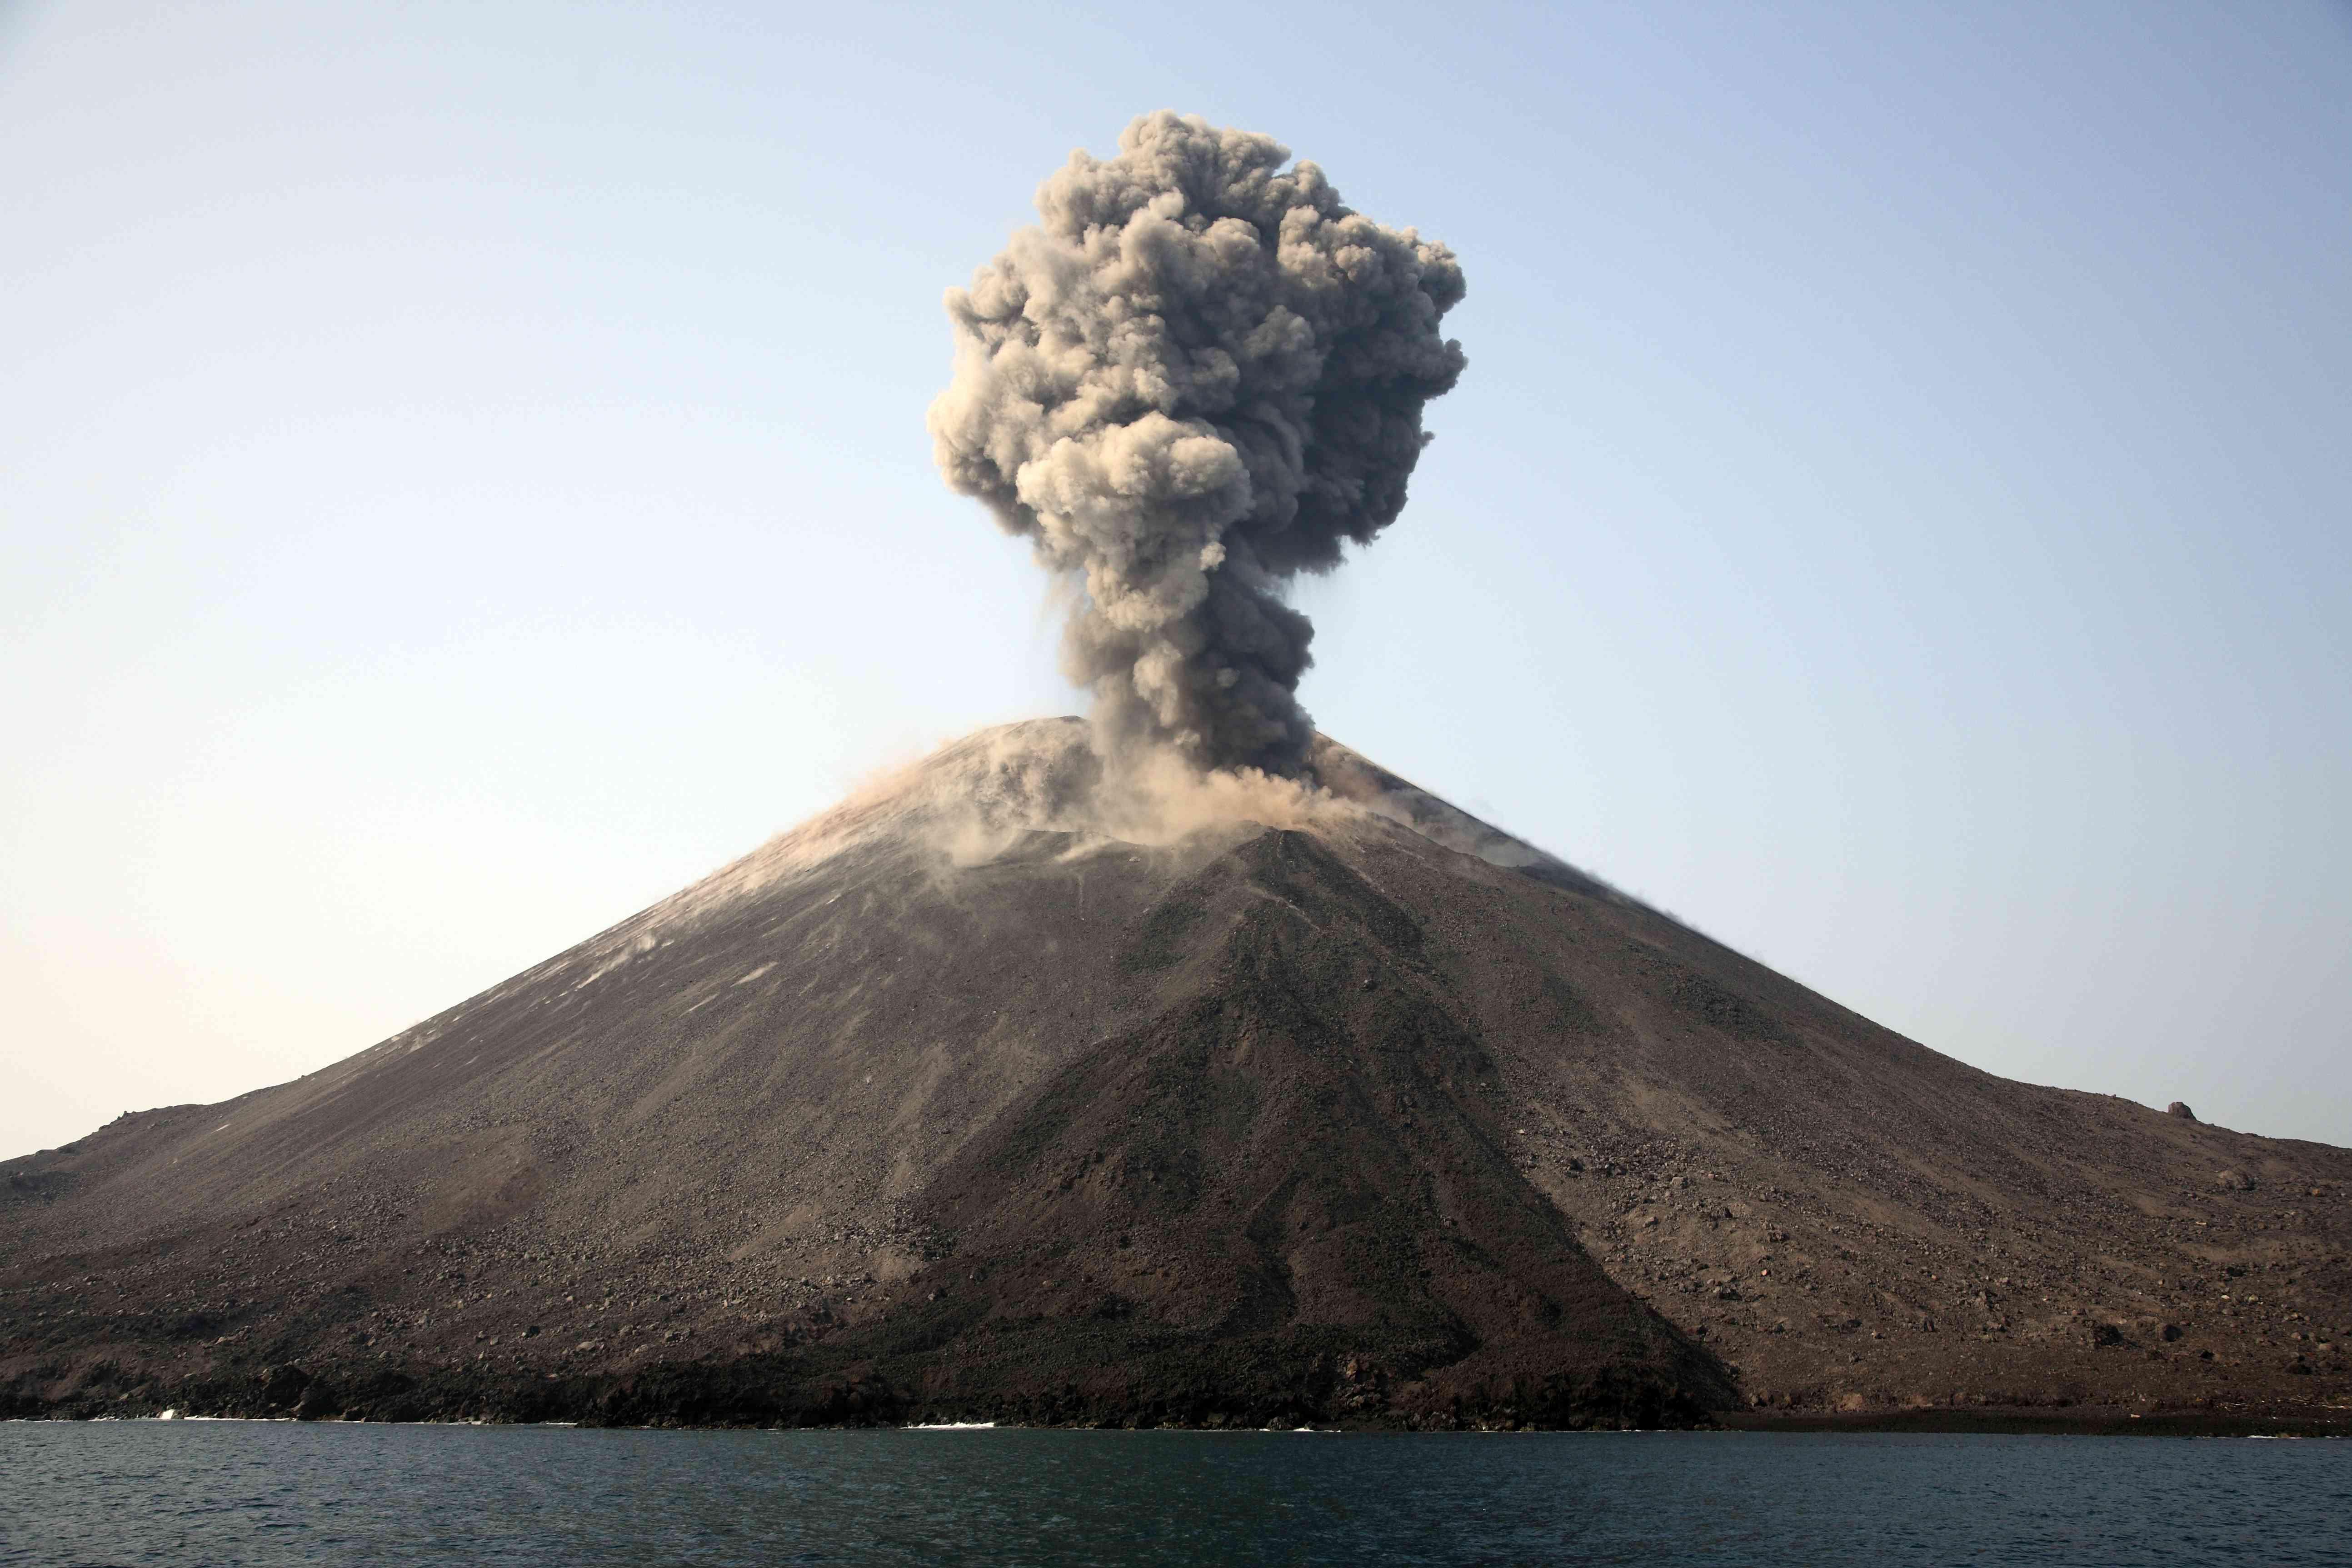 Anak Krakatau volcano erupting